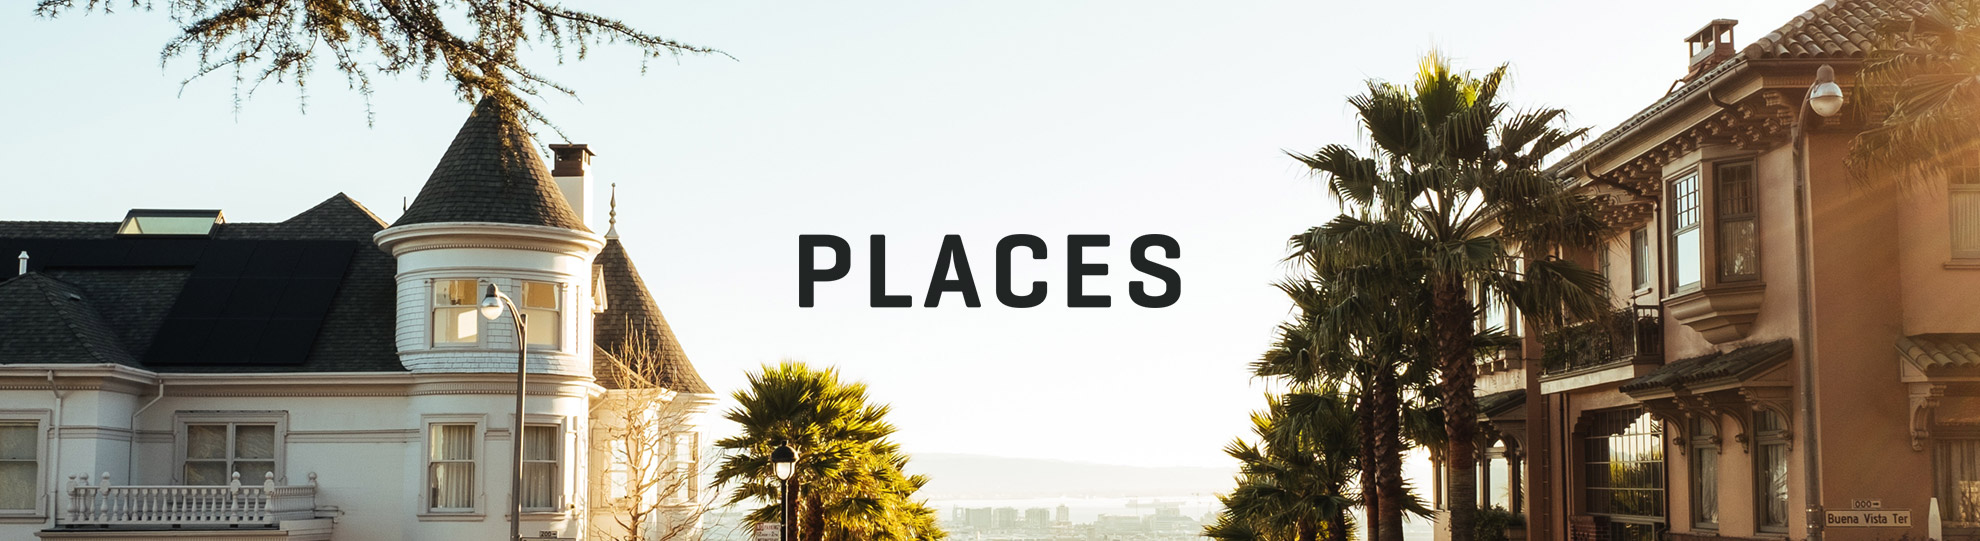 Wildsam-Places-Header.jpg